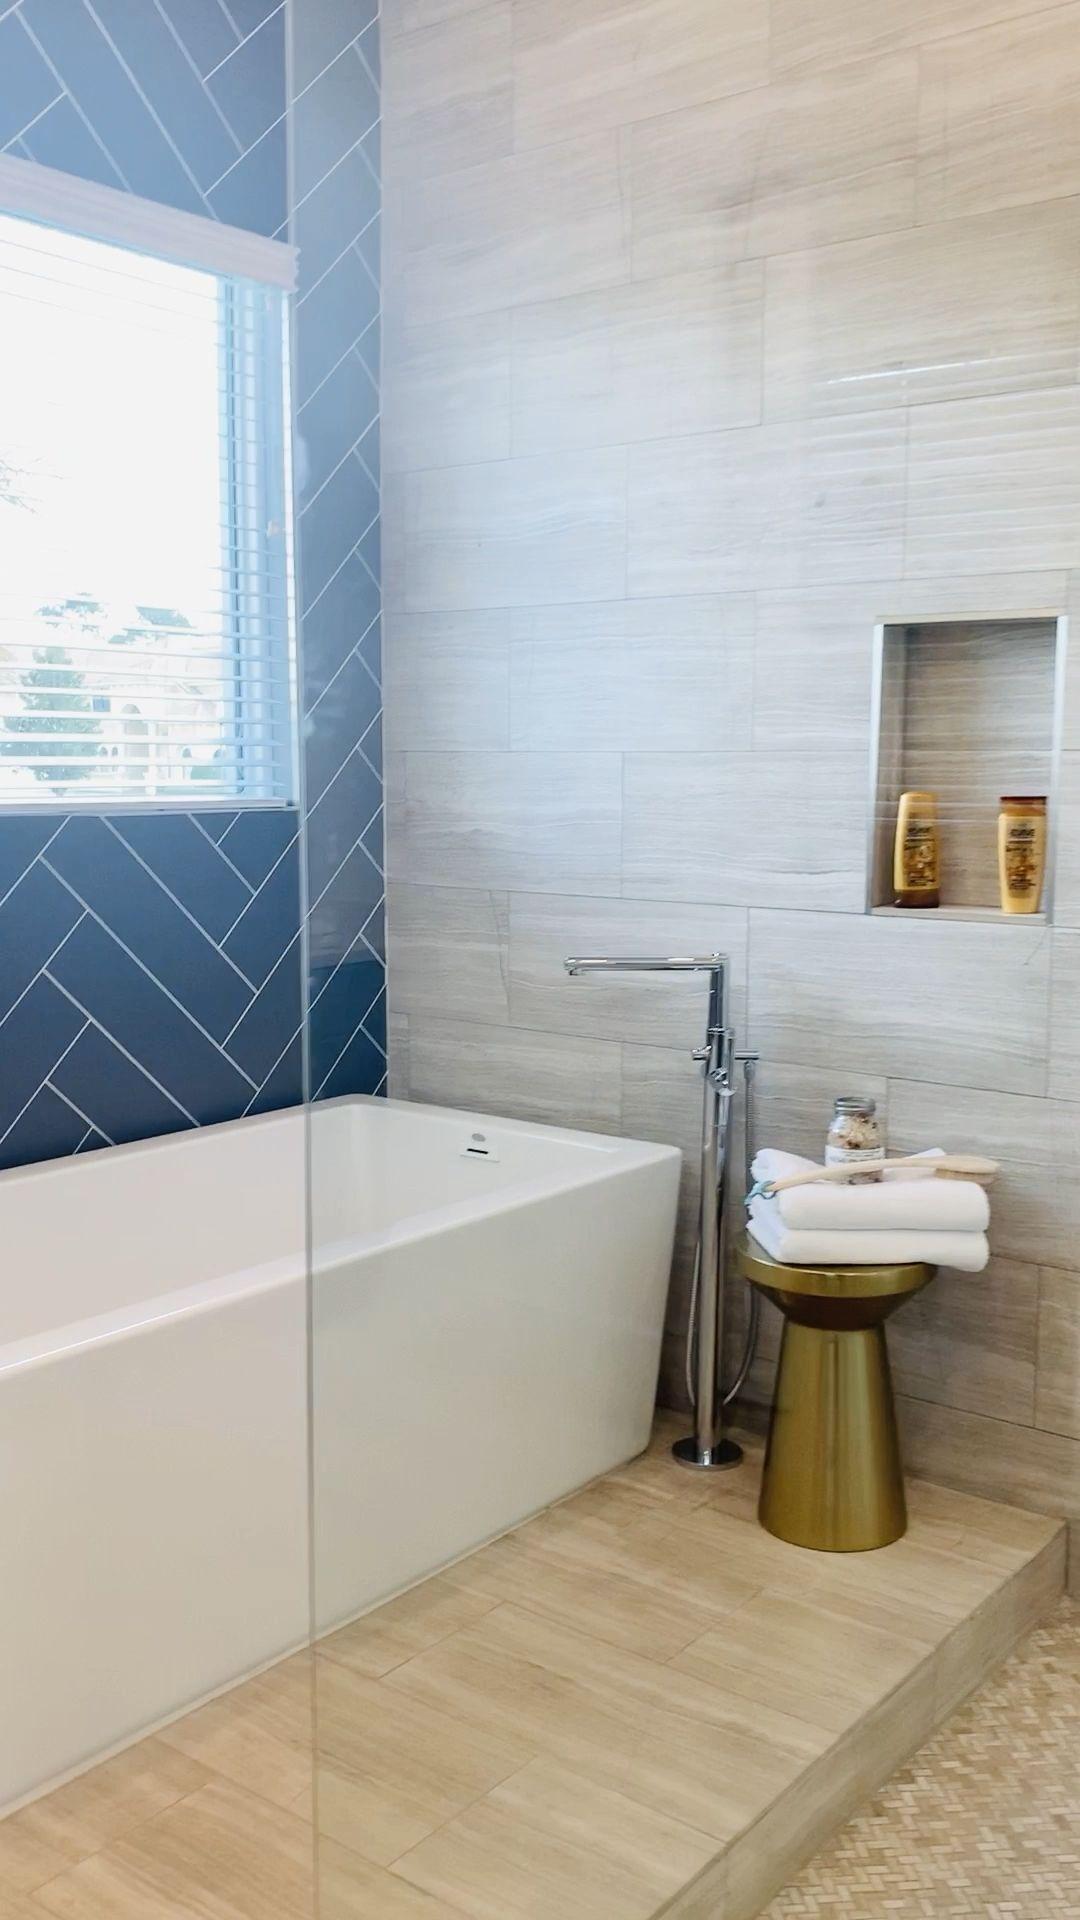 Photo of Luxury Bathroom Suite with Custom Tile Details